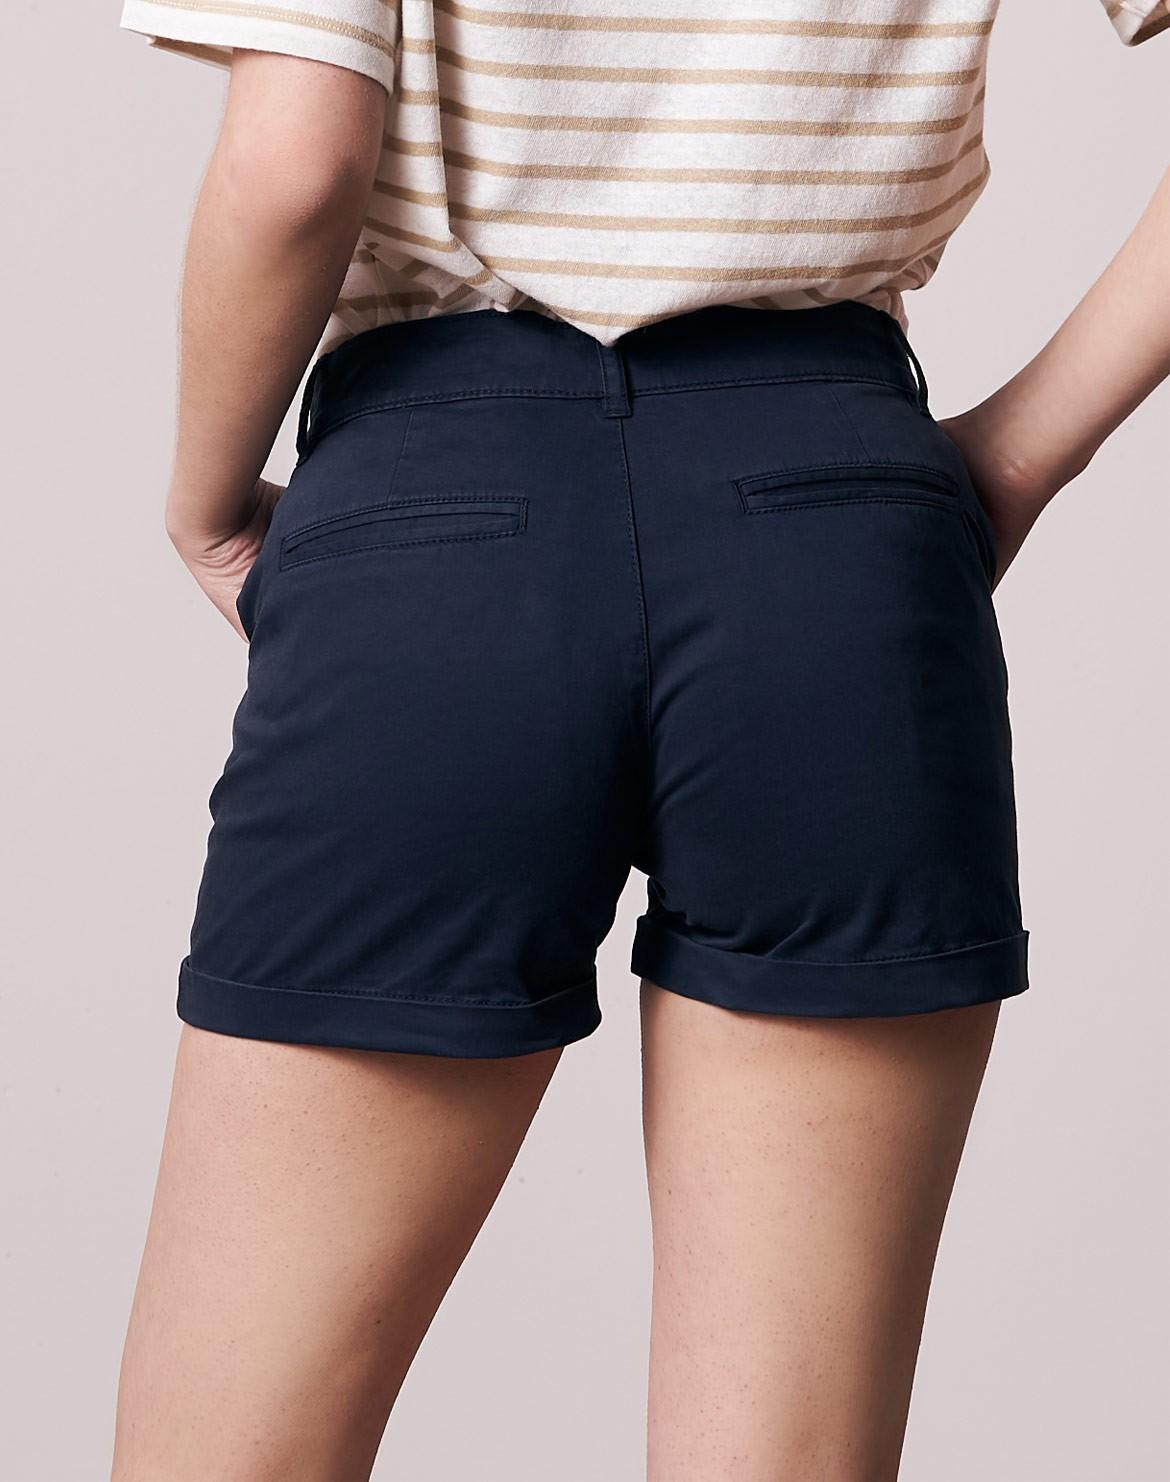 Eco Micro Chino Shorts